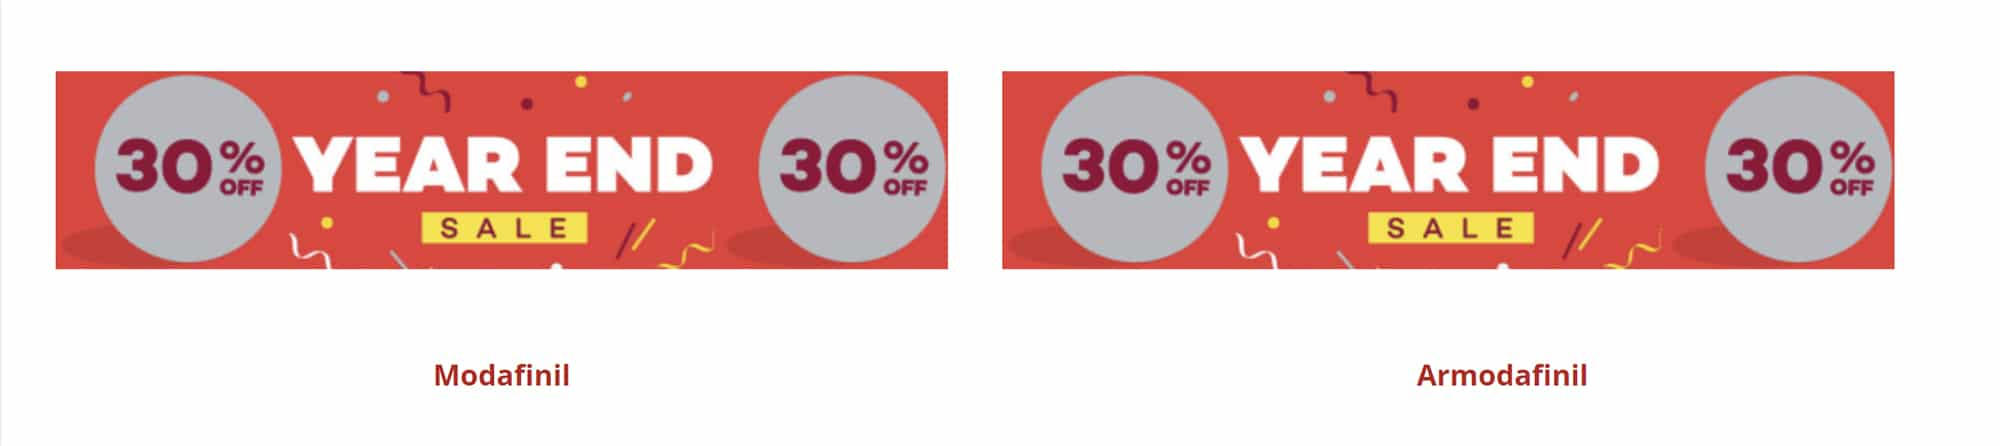 Shark Mood Sale 30 percent